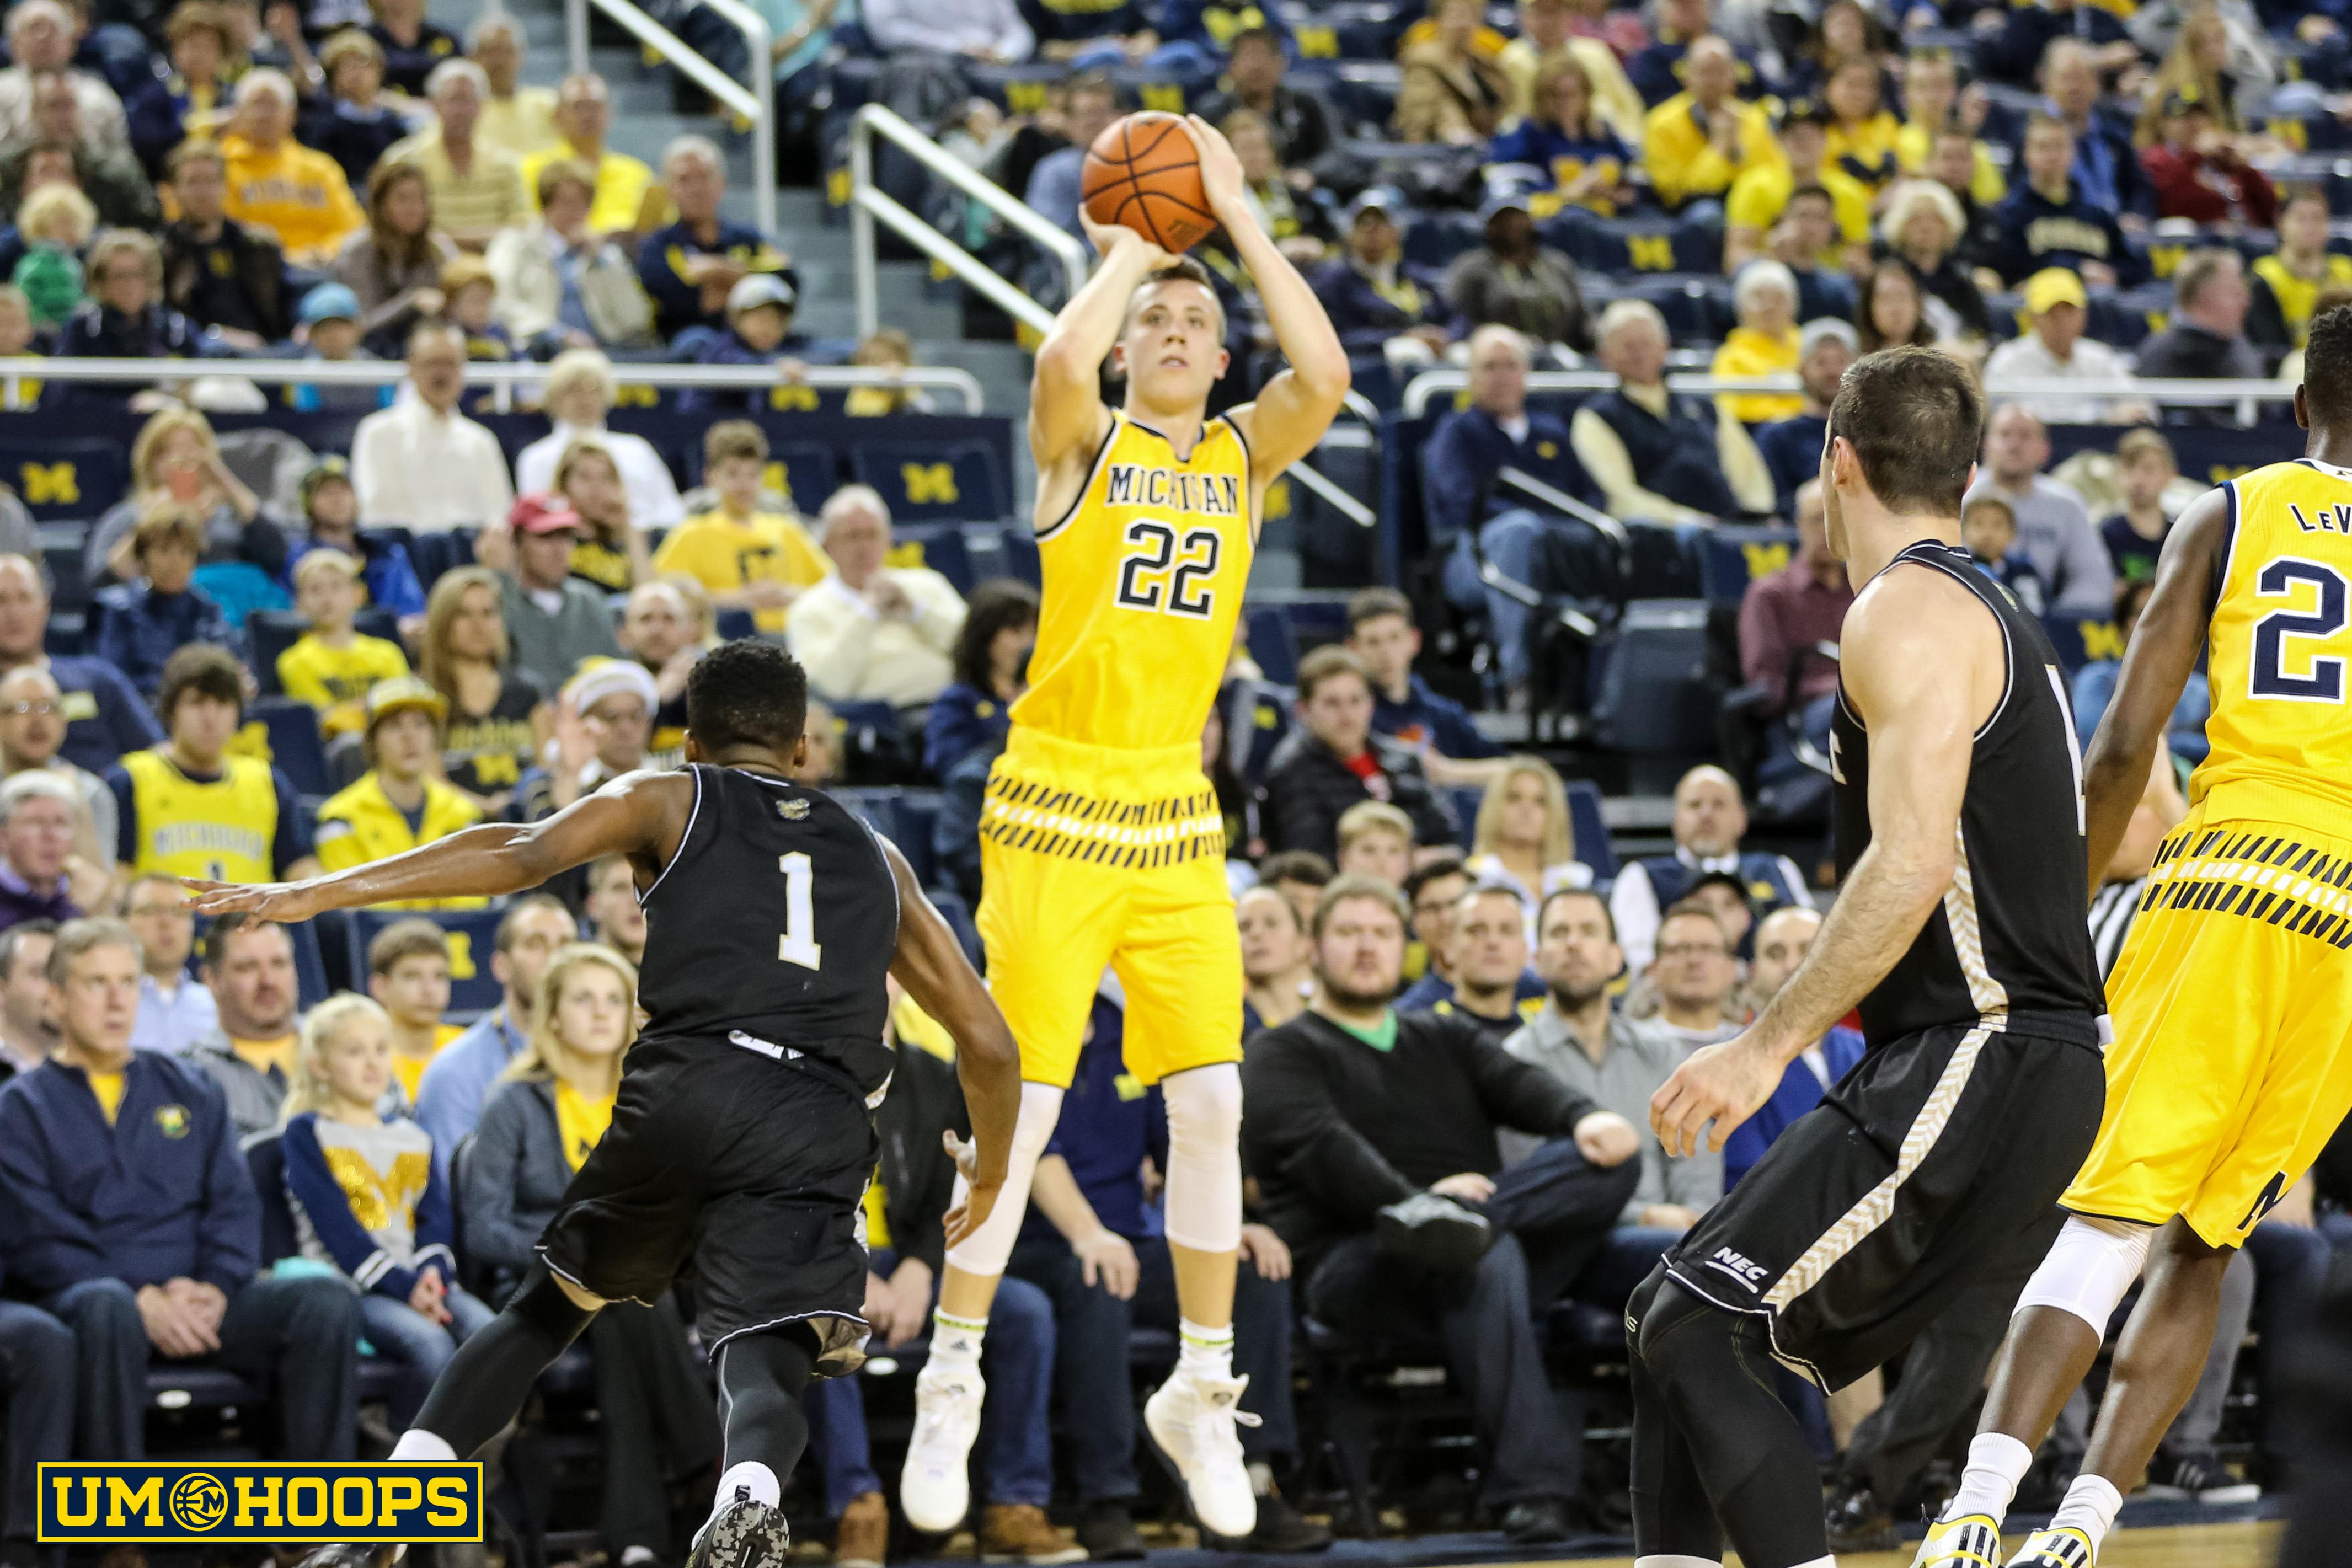 Michigan 96, Bryant 60-13